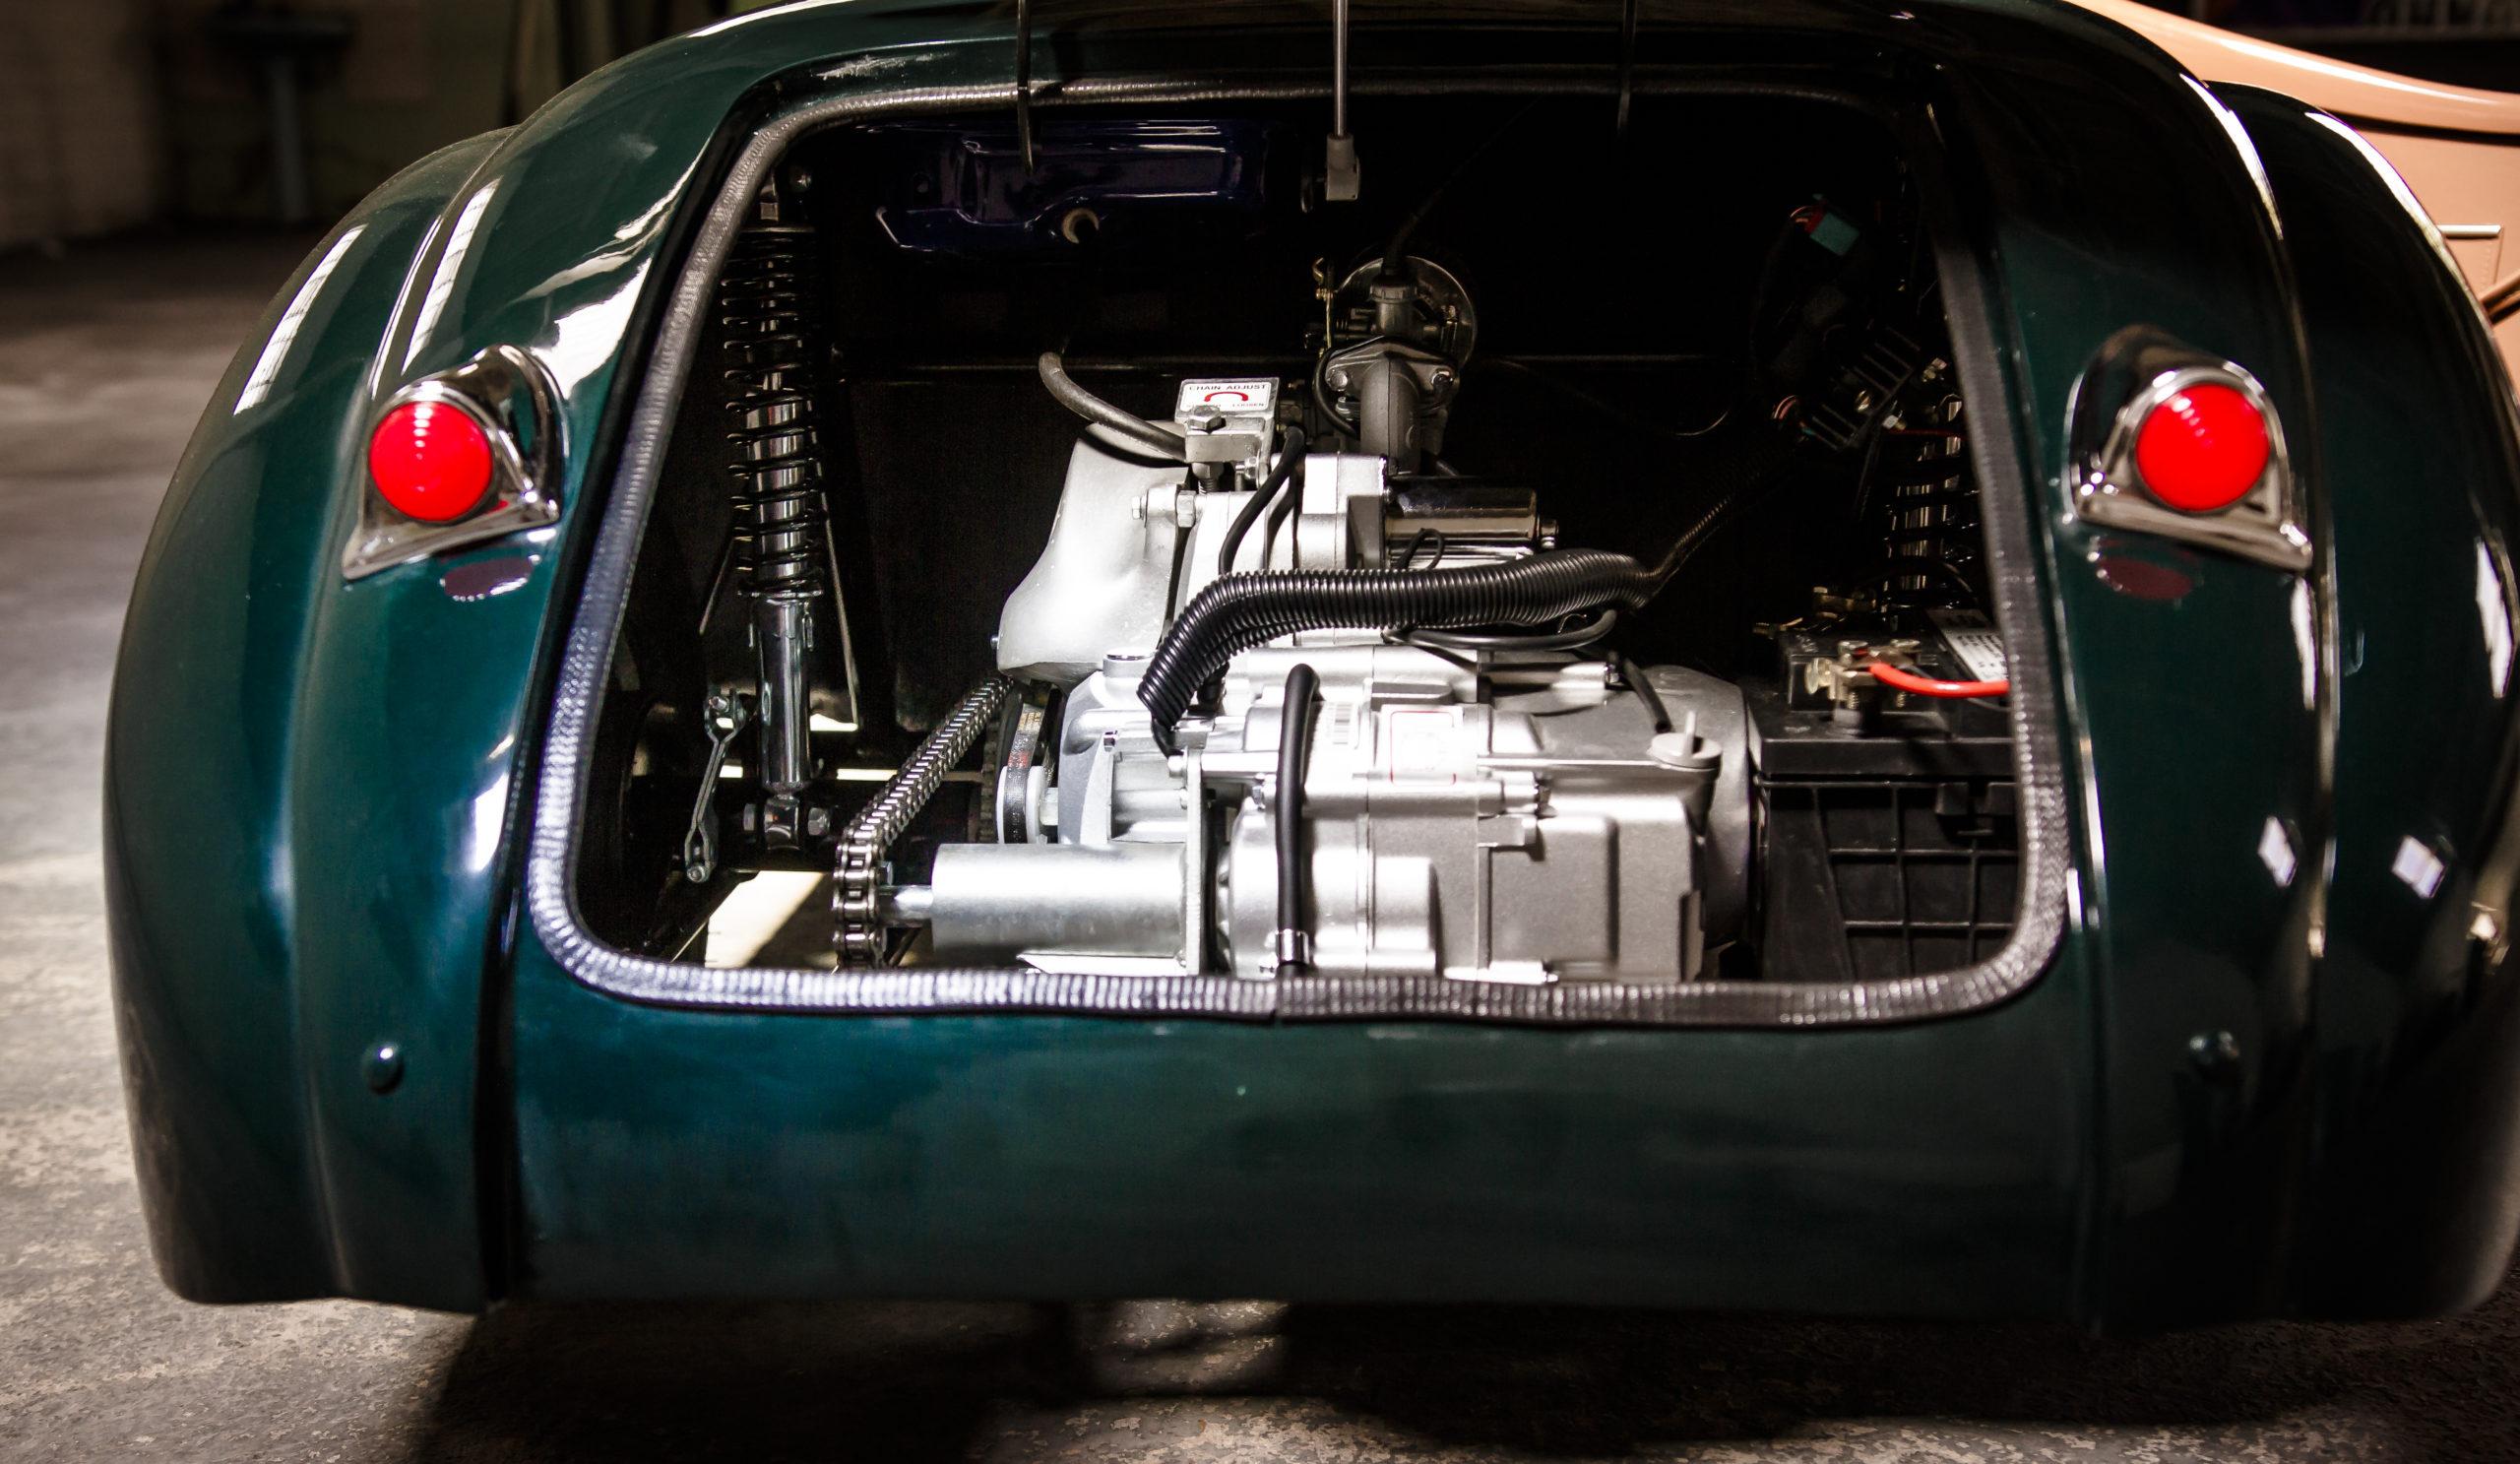 xk racer engine